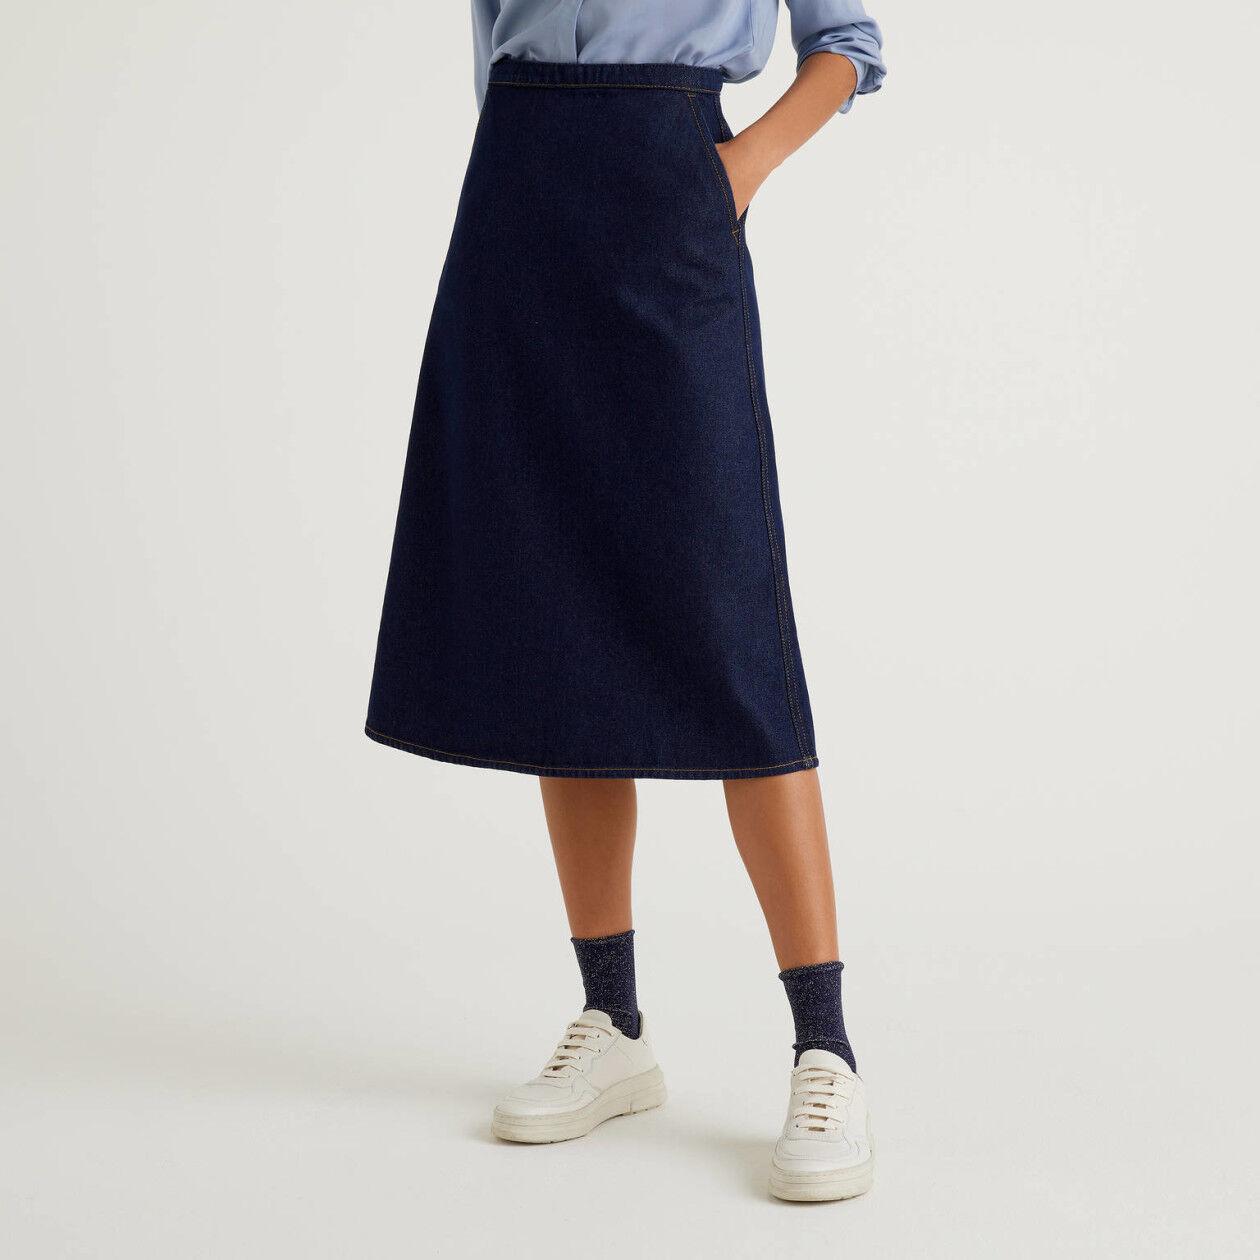 Midi skirt in 100% cotton denim